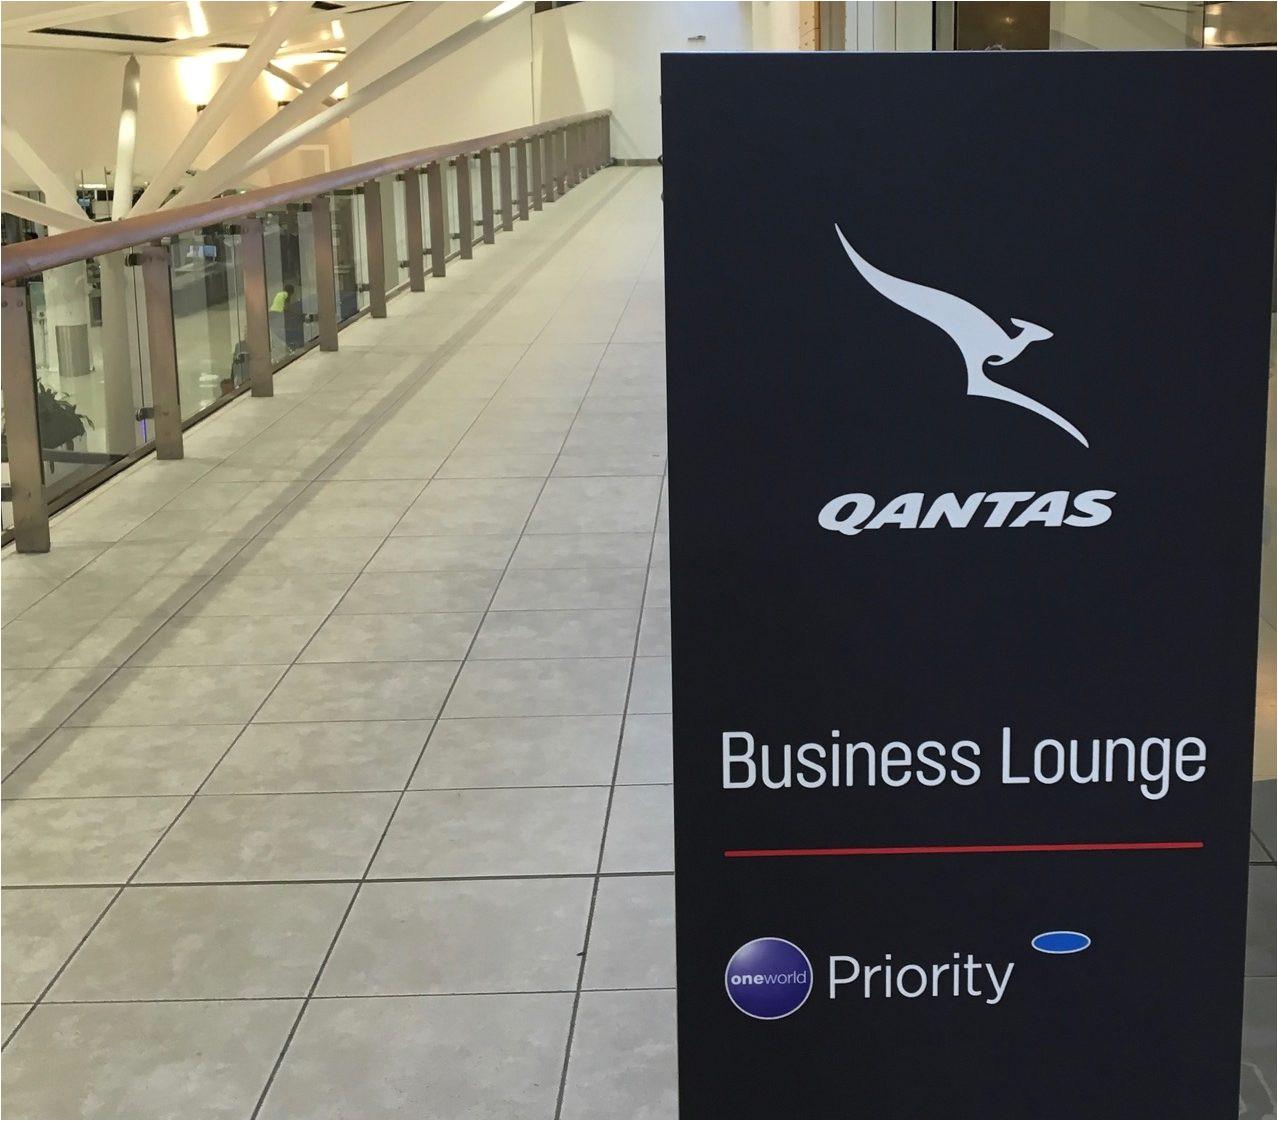 qantas international business lounge entrance 1 e1476332150836 jpg